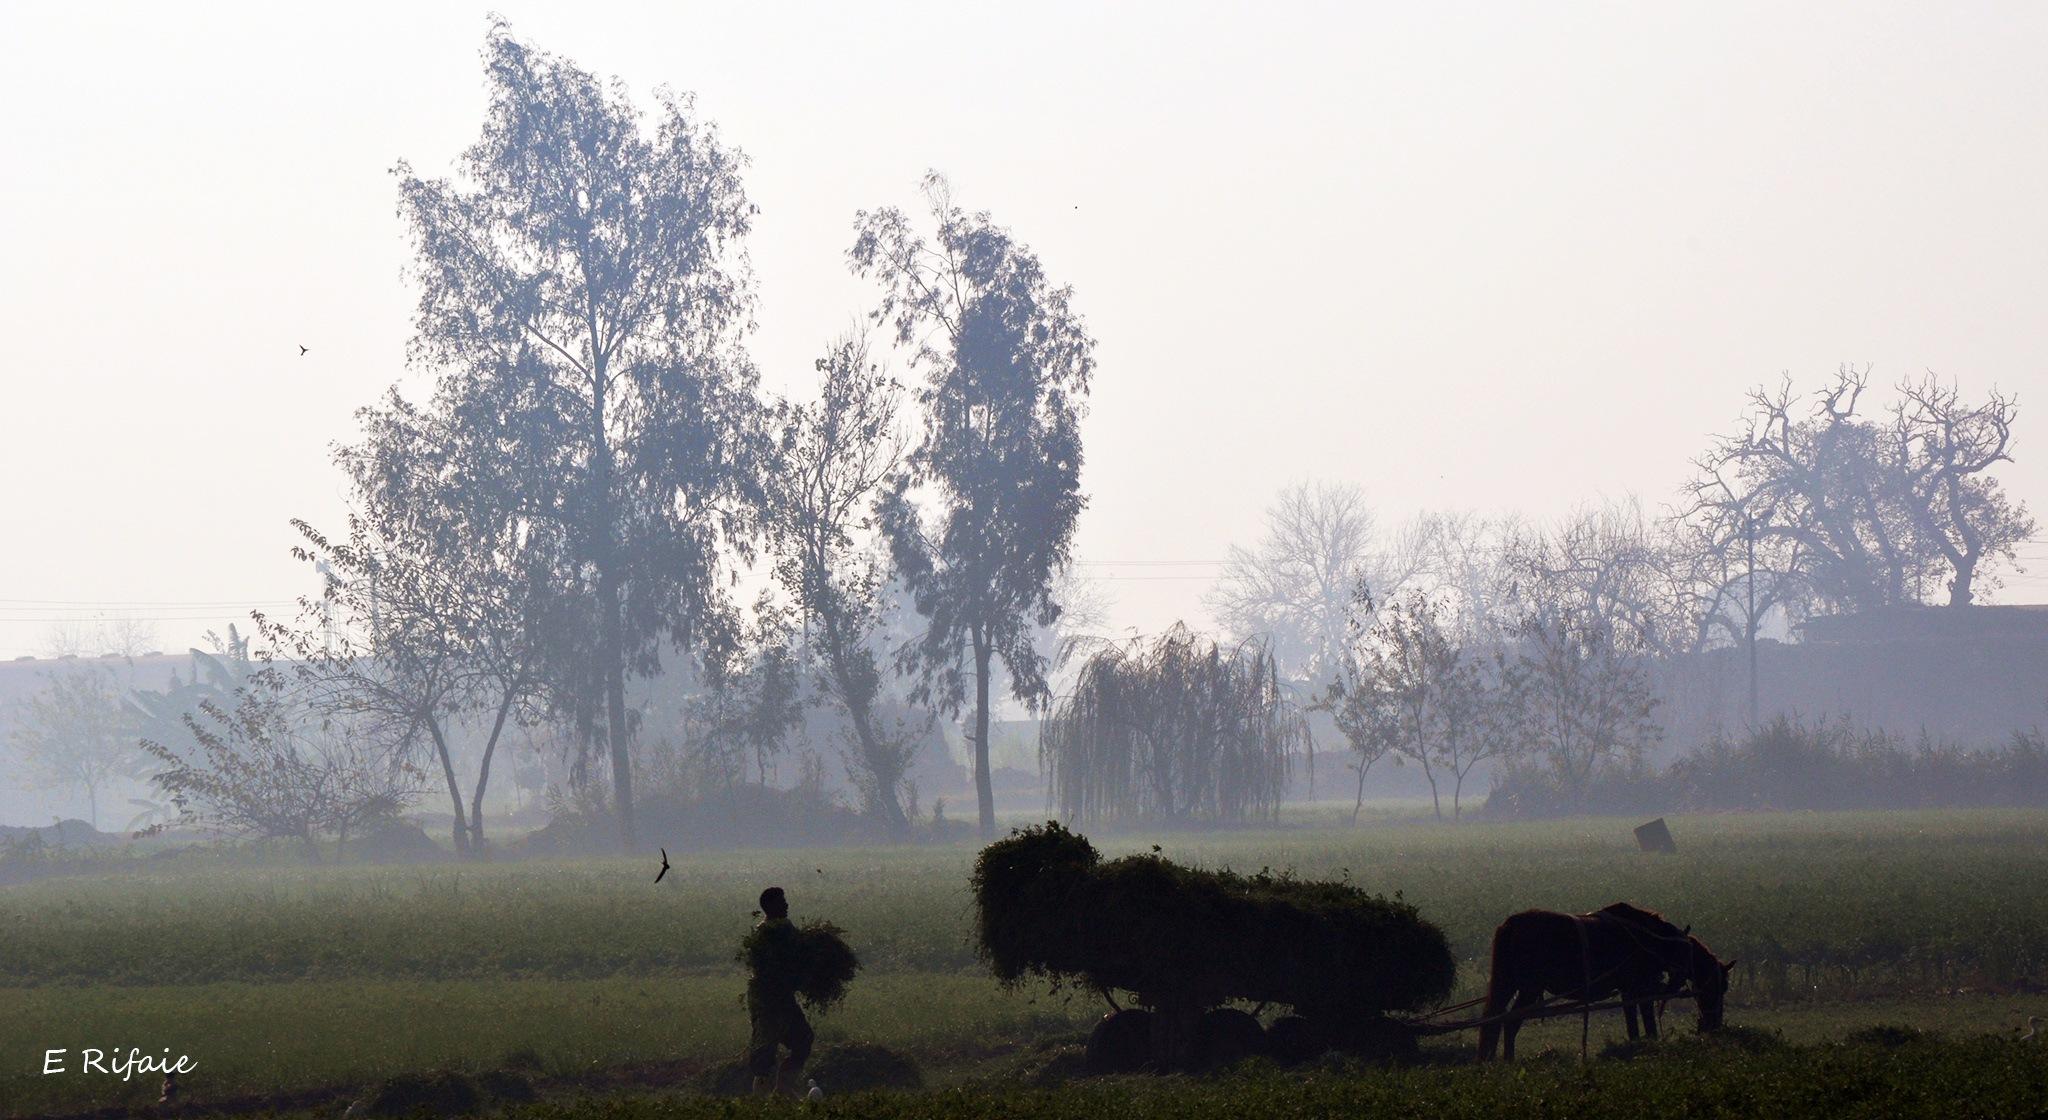 Countryside morning by Emad Eldin Moustafa El Refaie